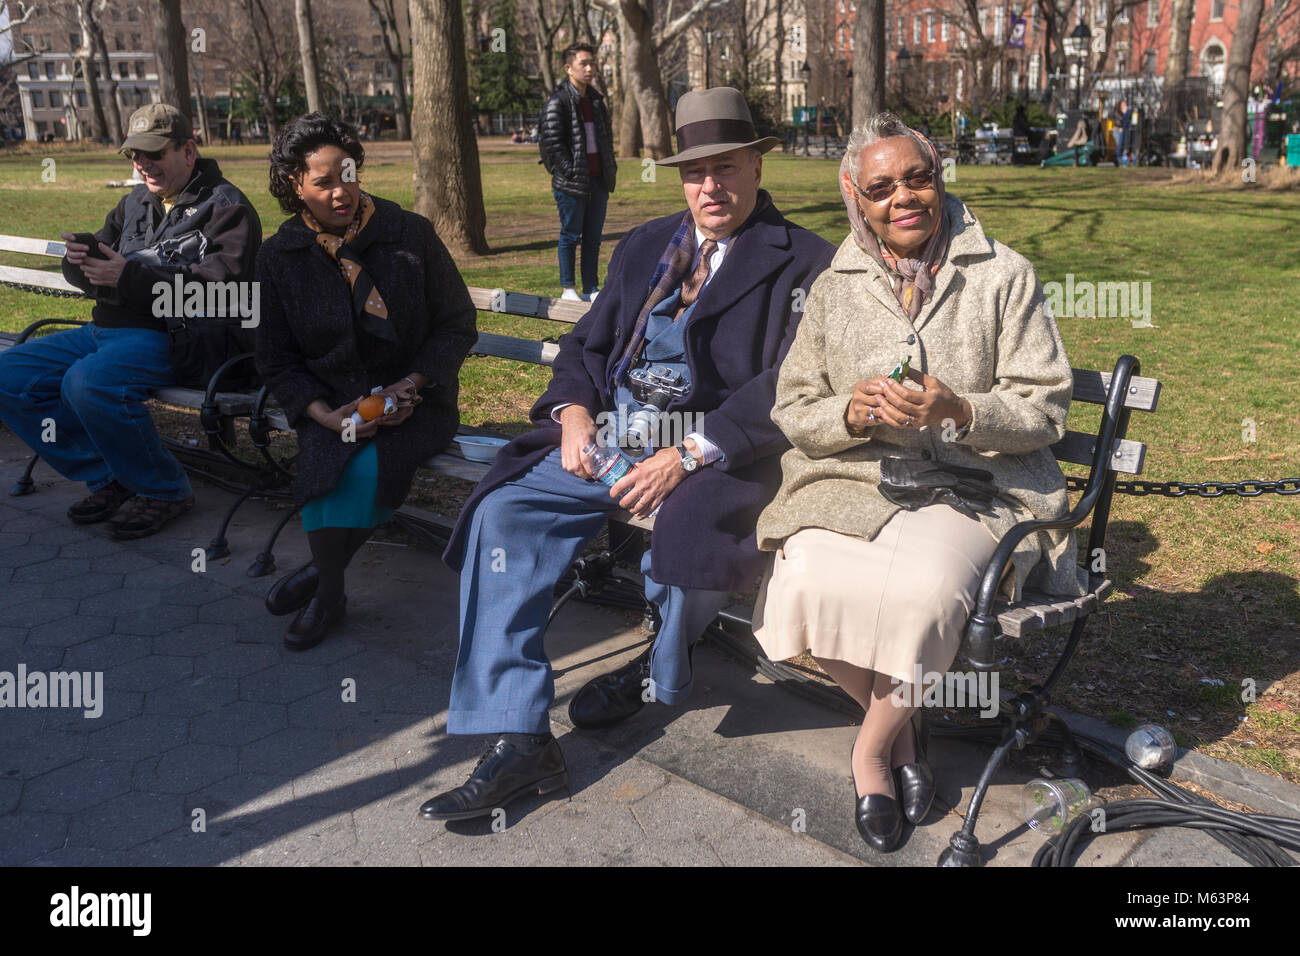 "New York, NY, USA, 28. Februar 2018 - vor Ort bei den Dreharbeiten zu ""Motherless Brooklyn, am Washington Square Stockbild"